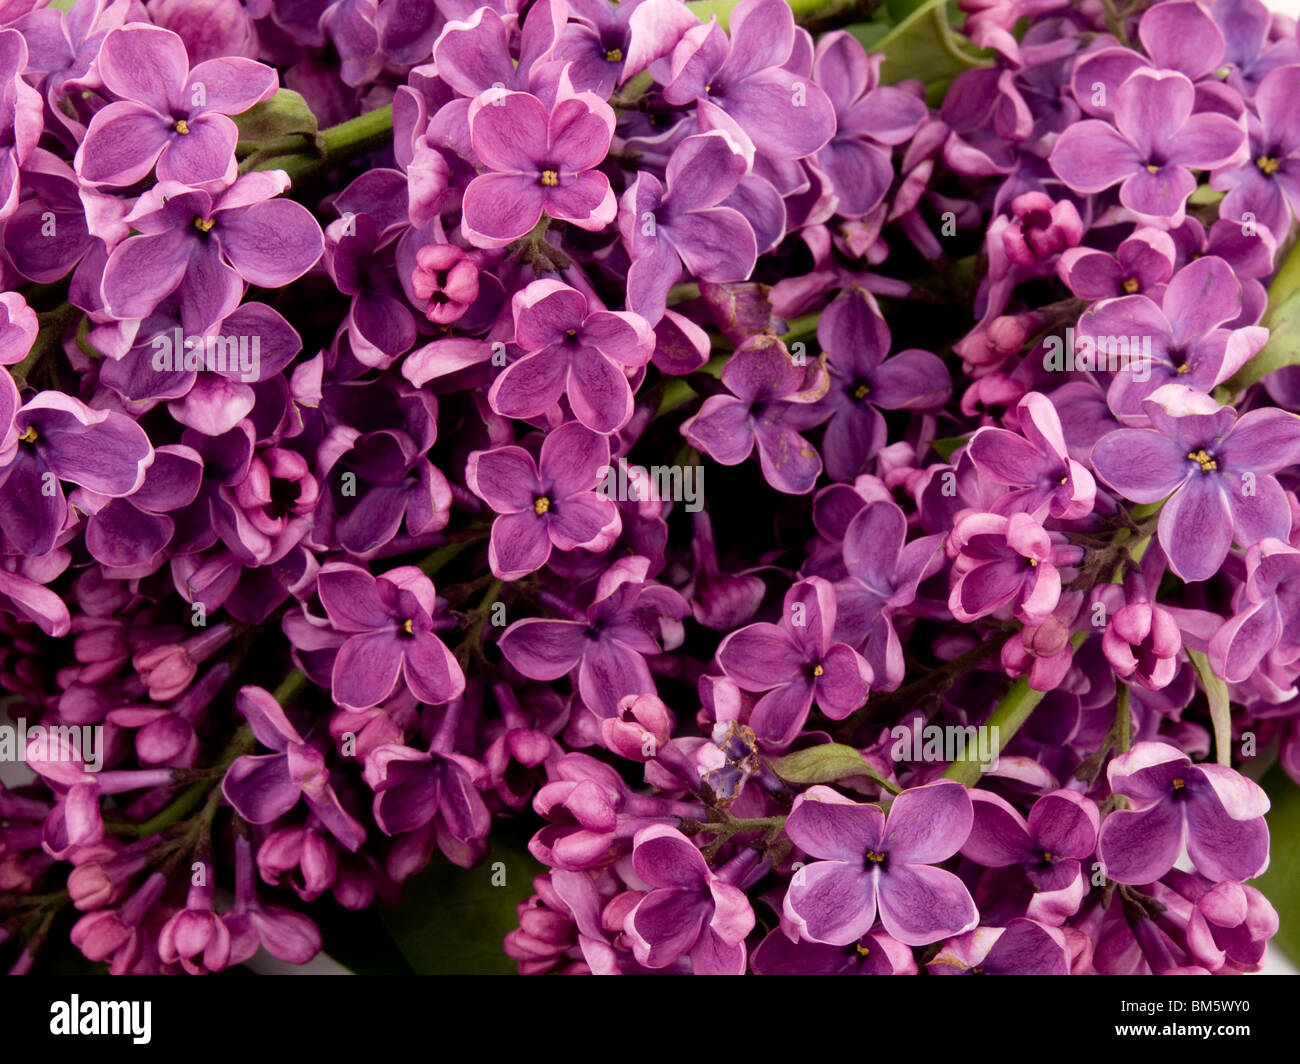 Closeup picture of beautiful purple lilac - Stock Image